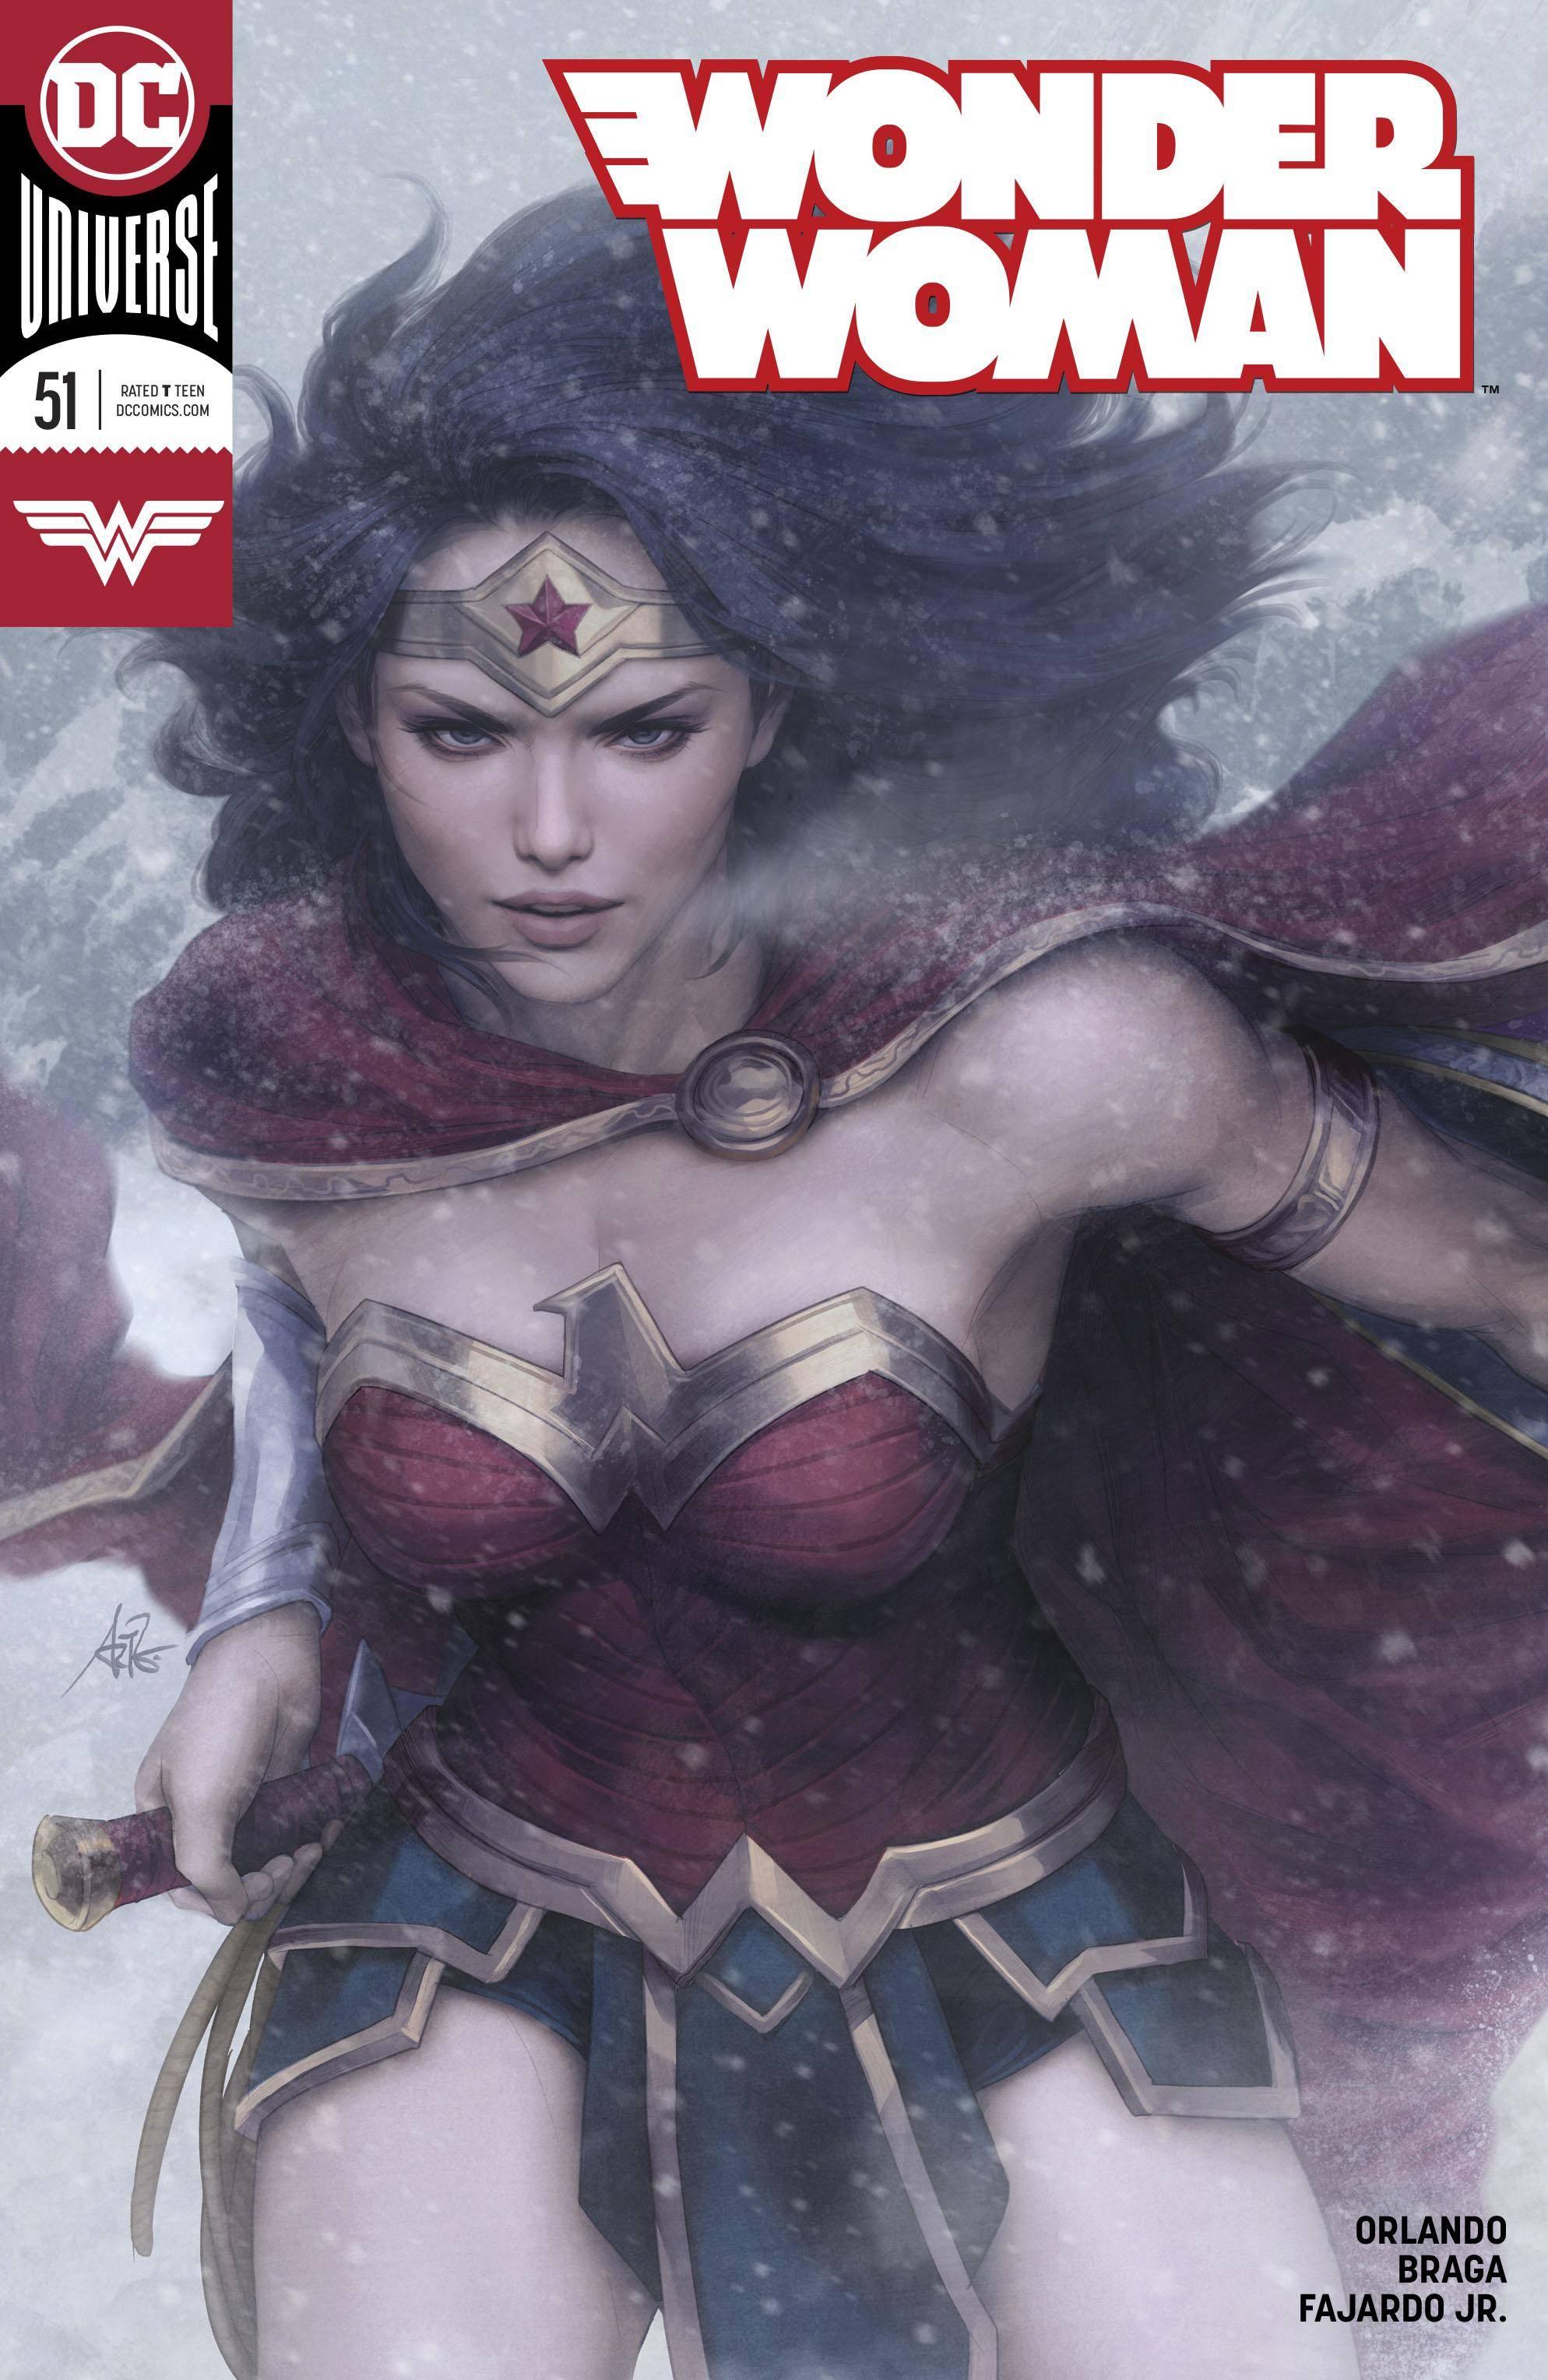 Wonder Woman 051 2018 2 covers digital Minutemen